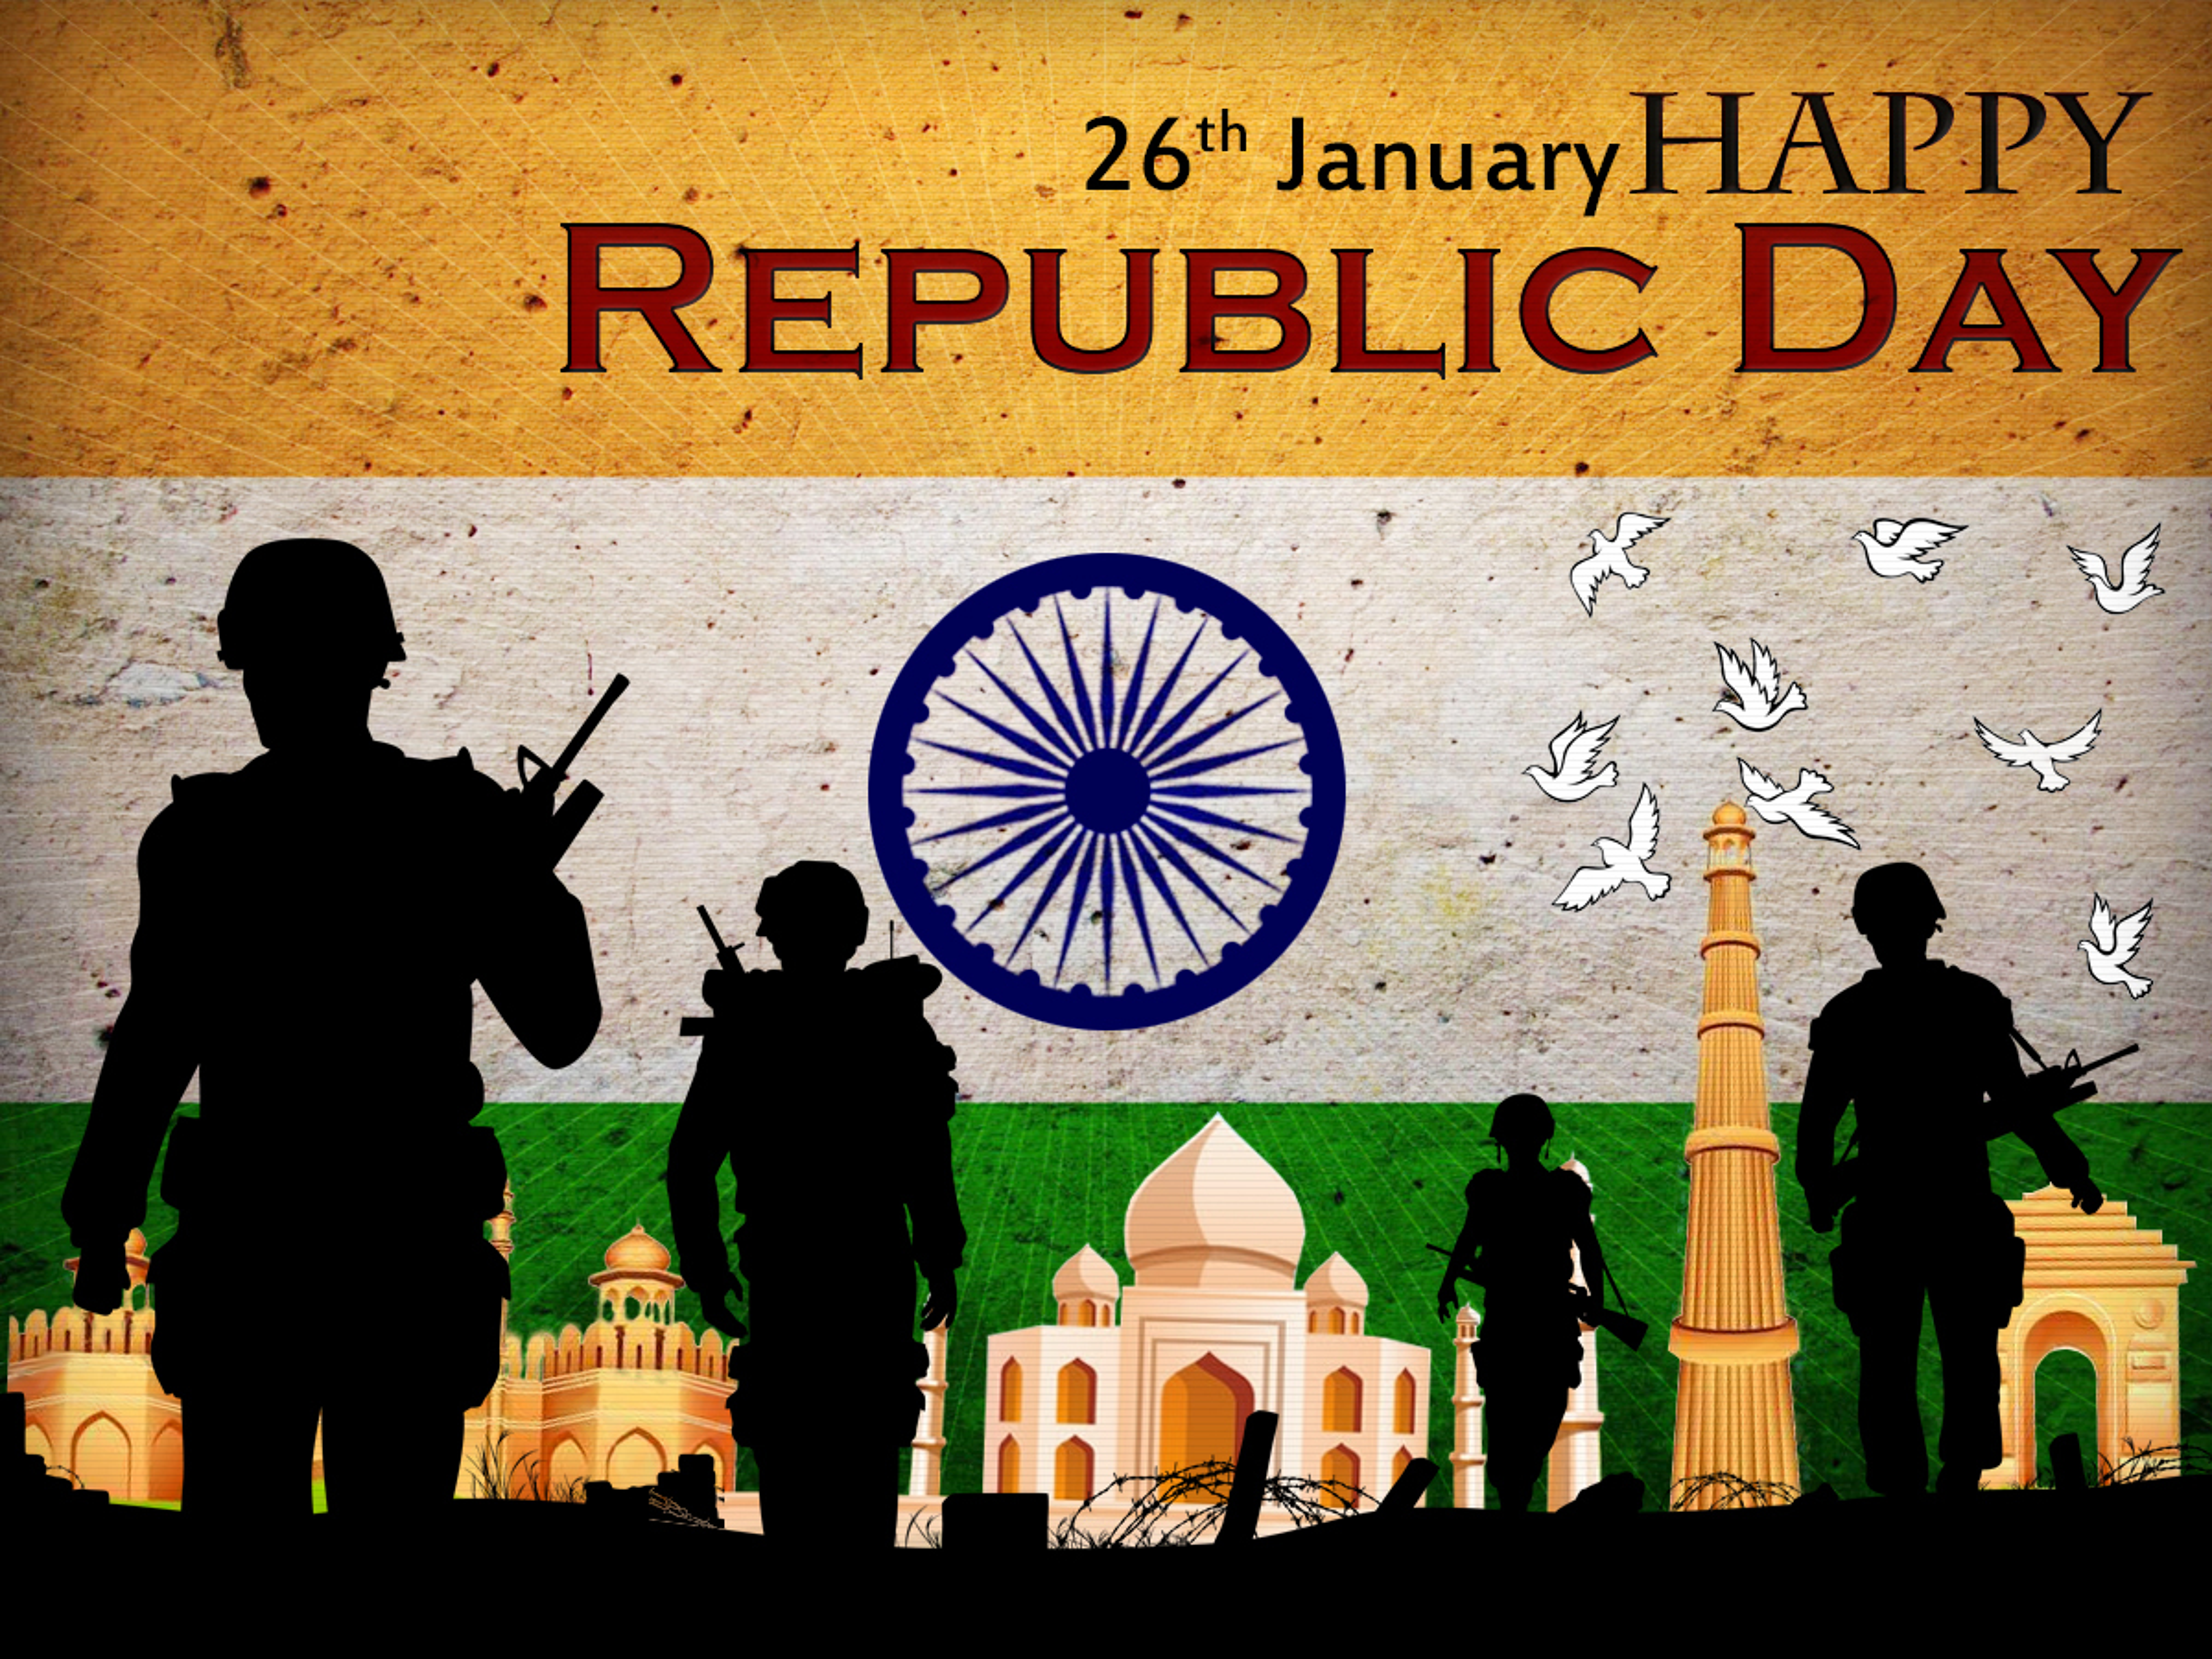 Republic day image4